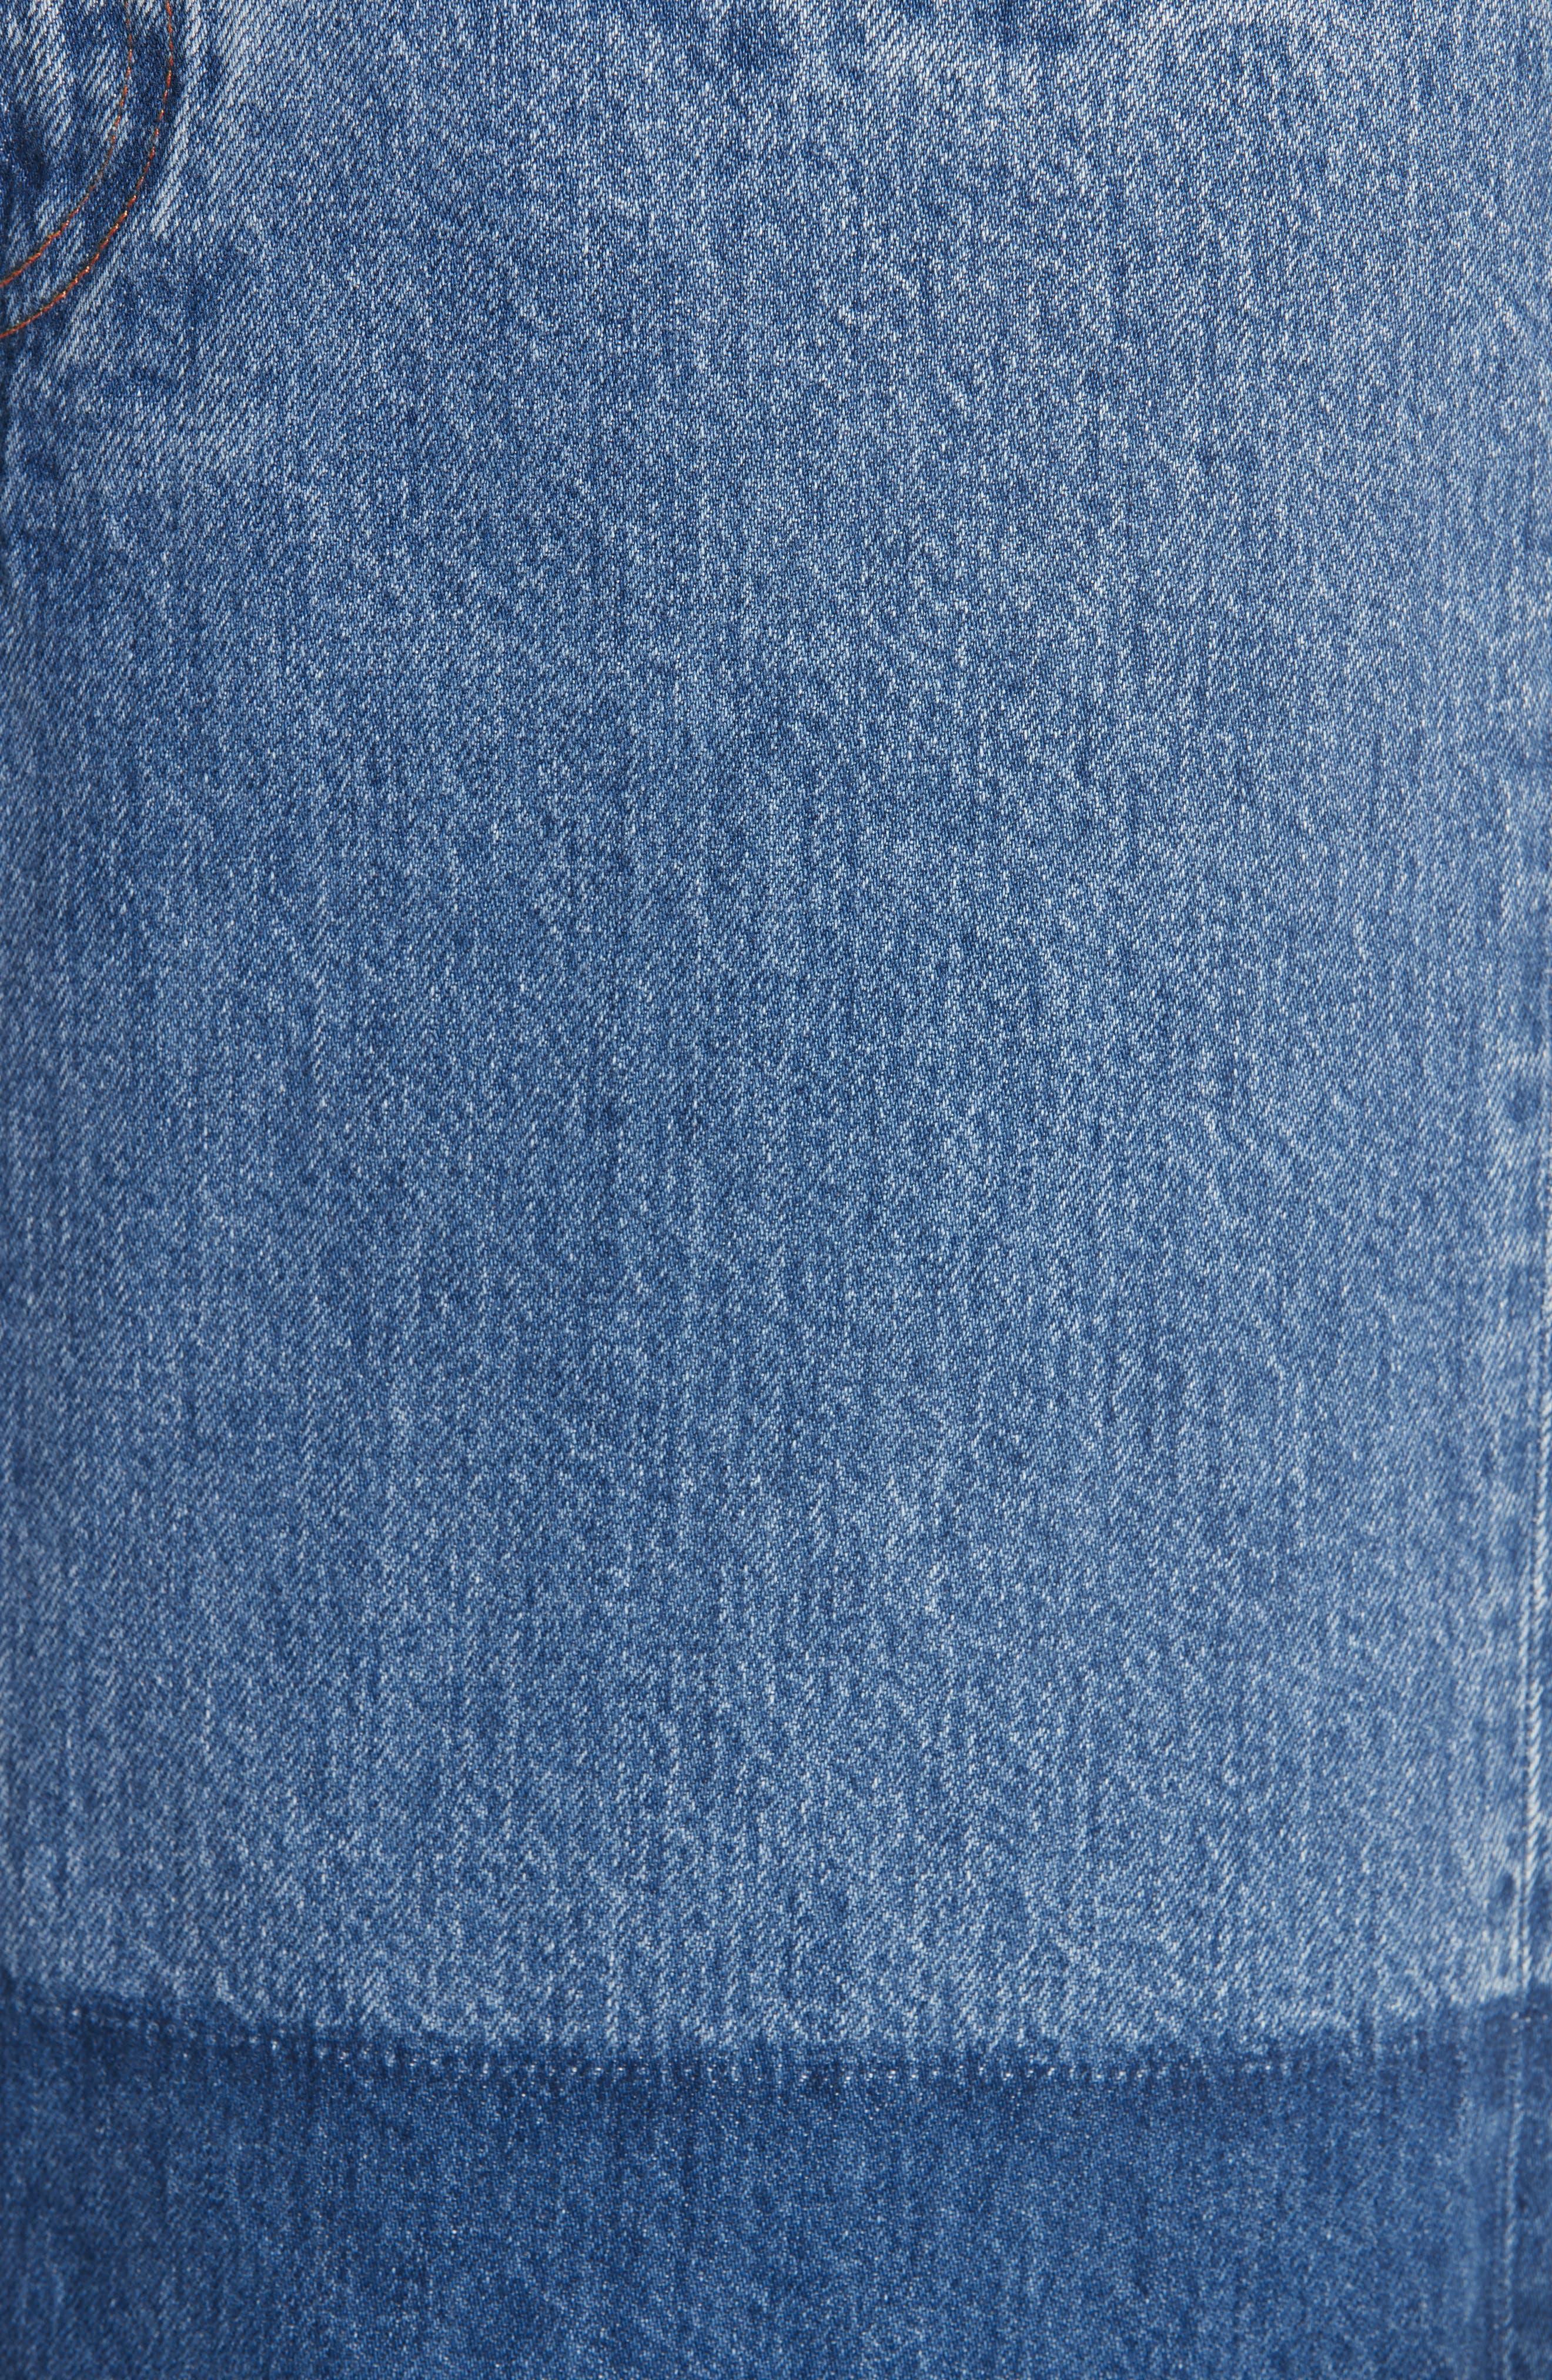 CALVIN KLEIN 205W39NYC,                             Reflective Stripe Mixed Wash Denim Skirt,                             Alternate thumbnail 5, color,                             BLUE